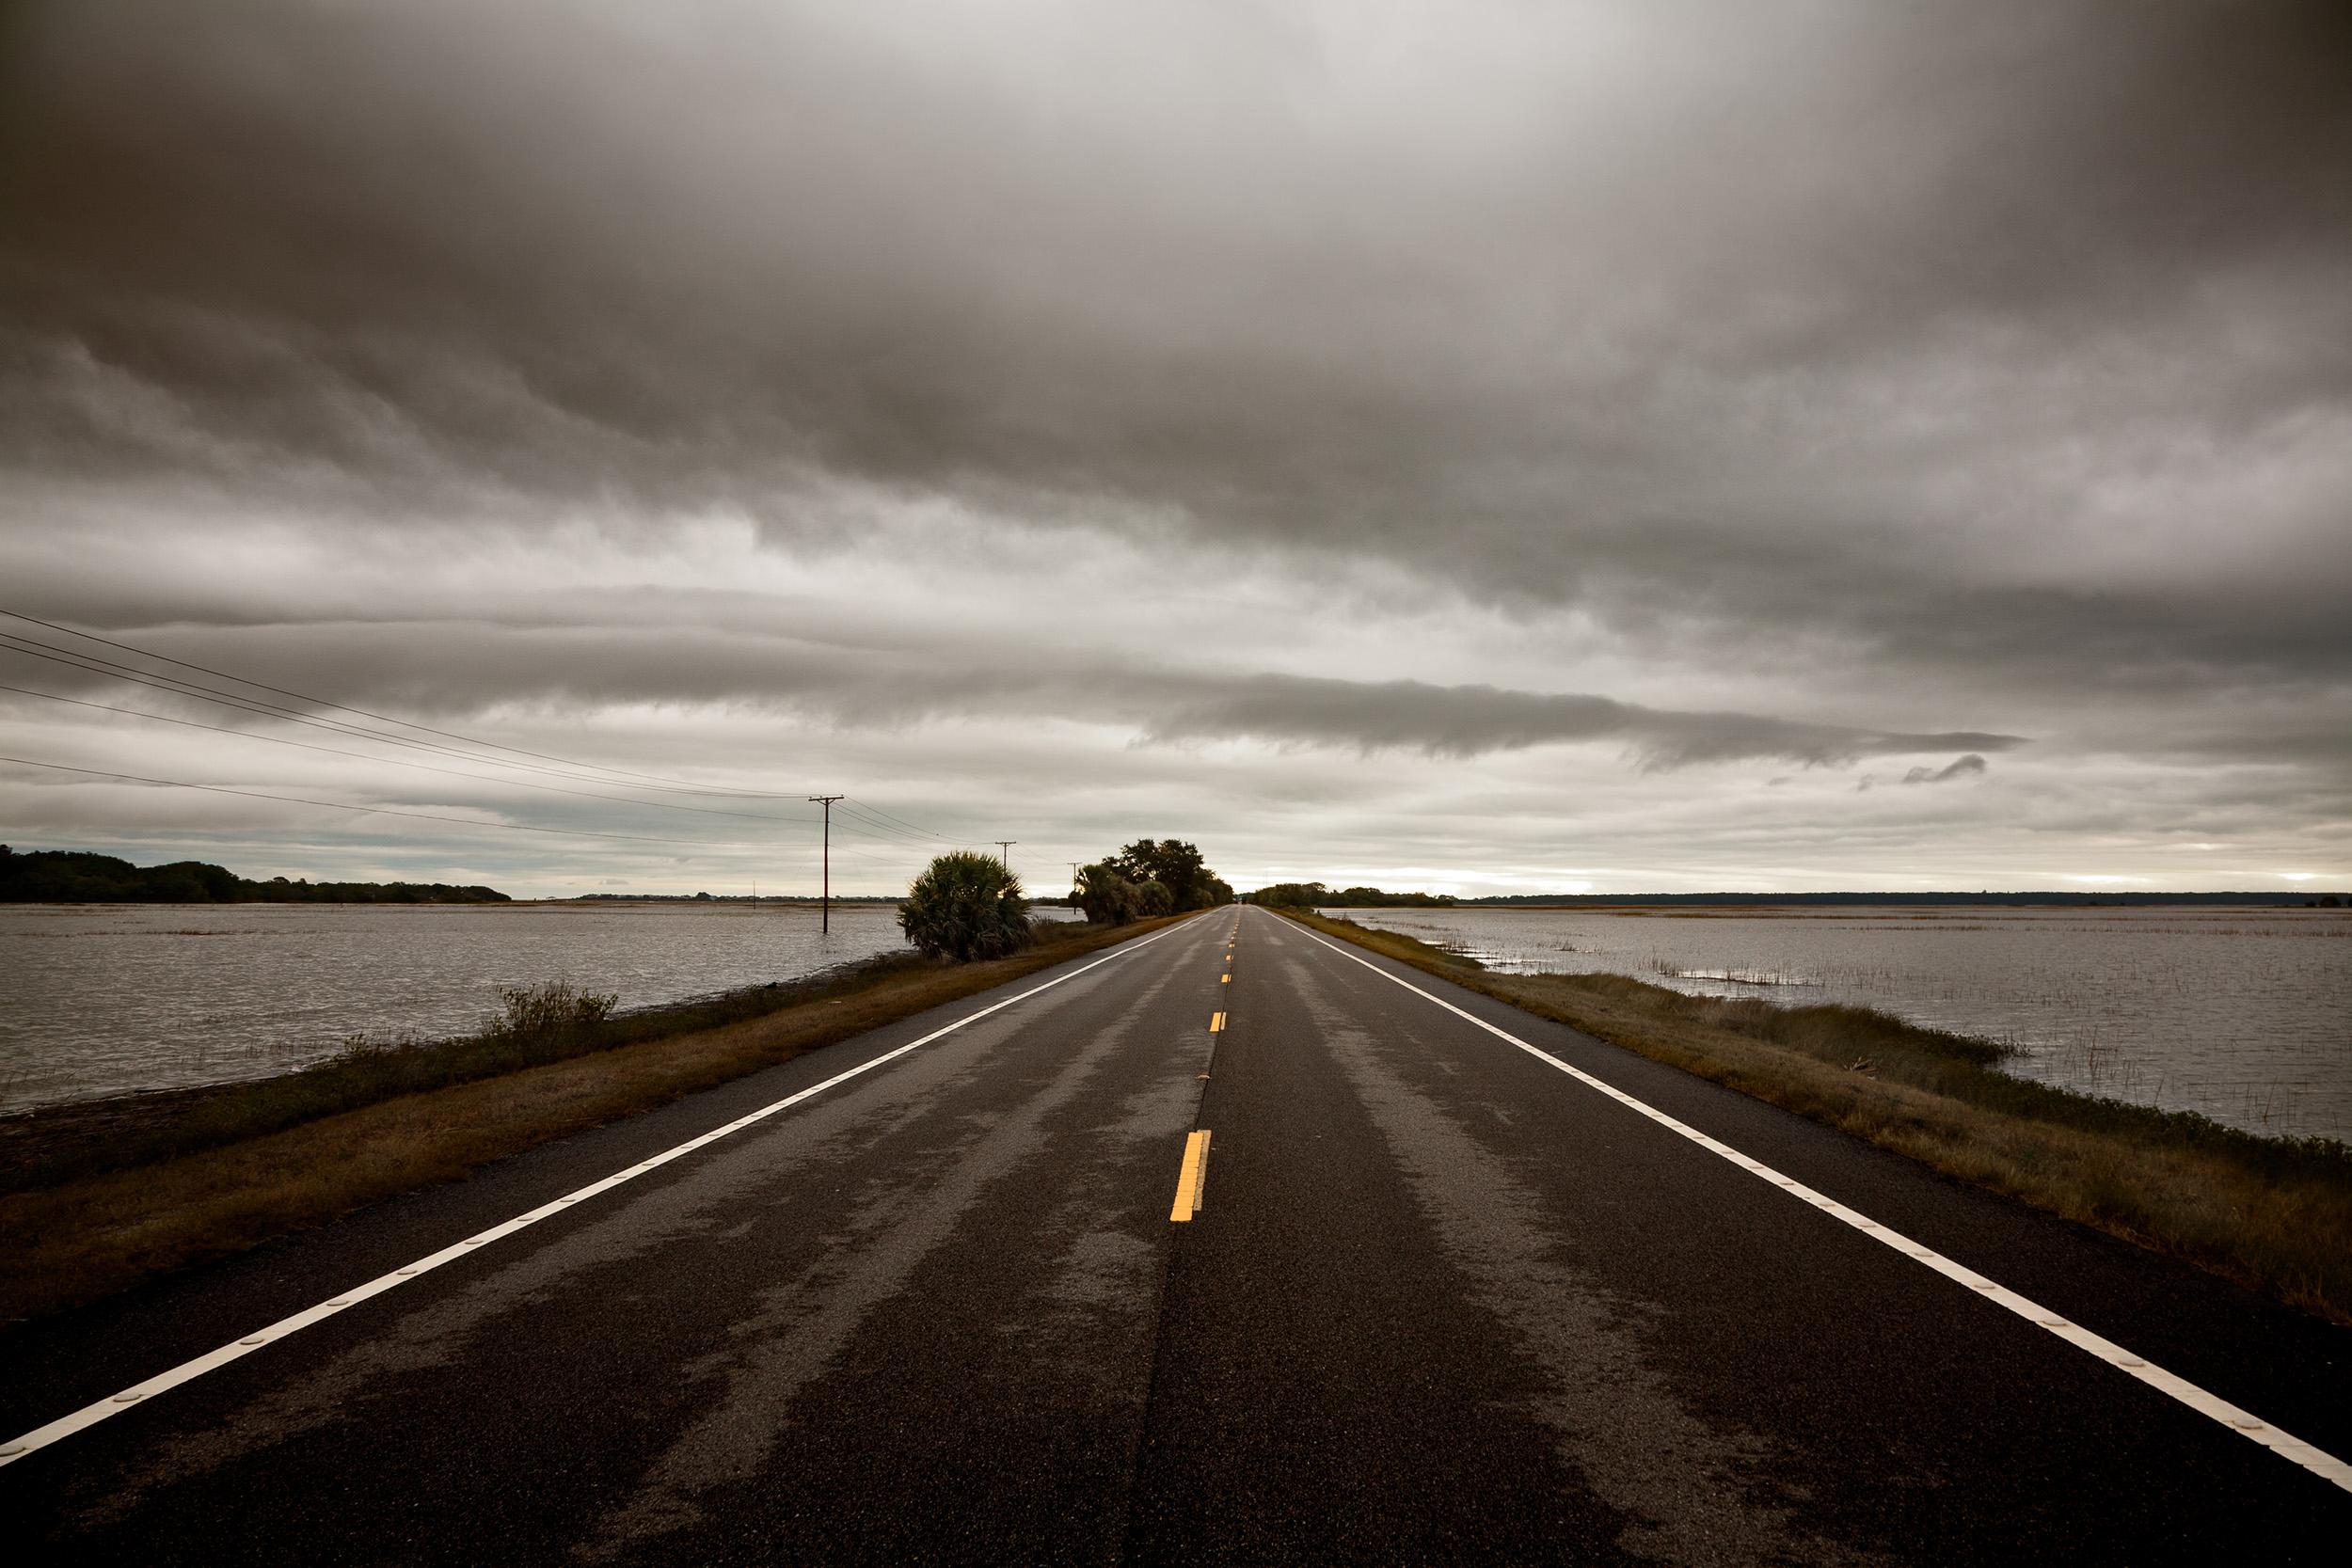 RSmith_RoadCentered-4587_2500.jpg